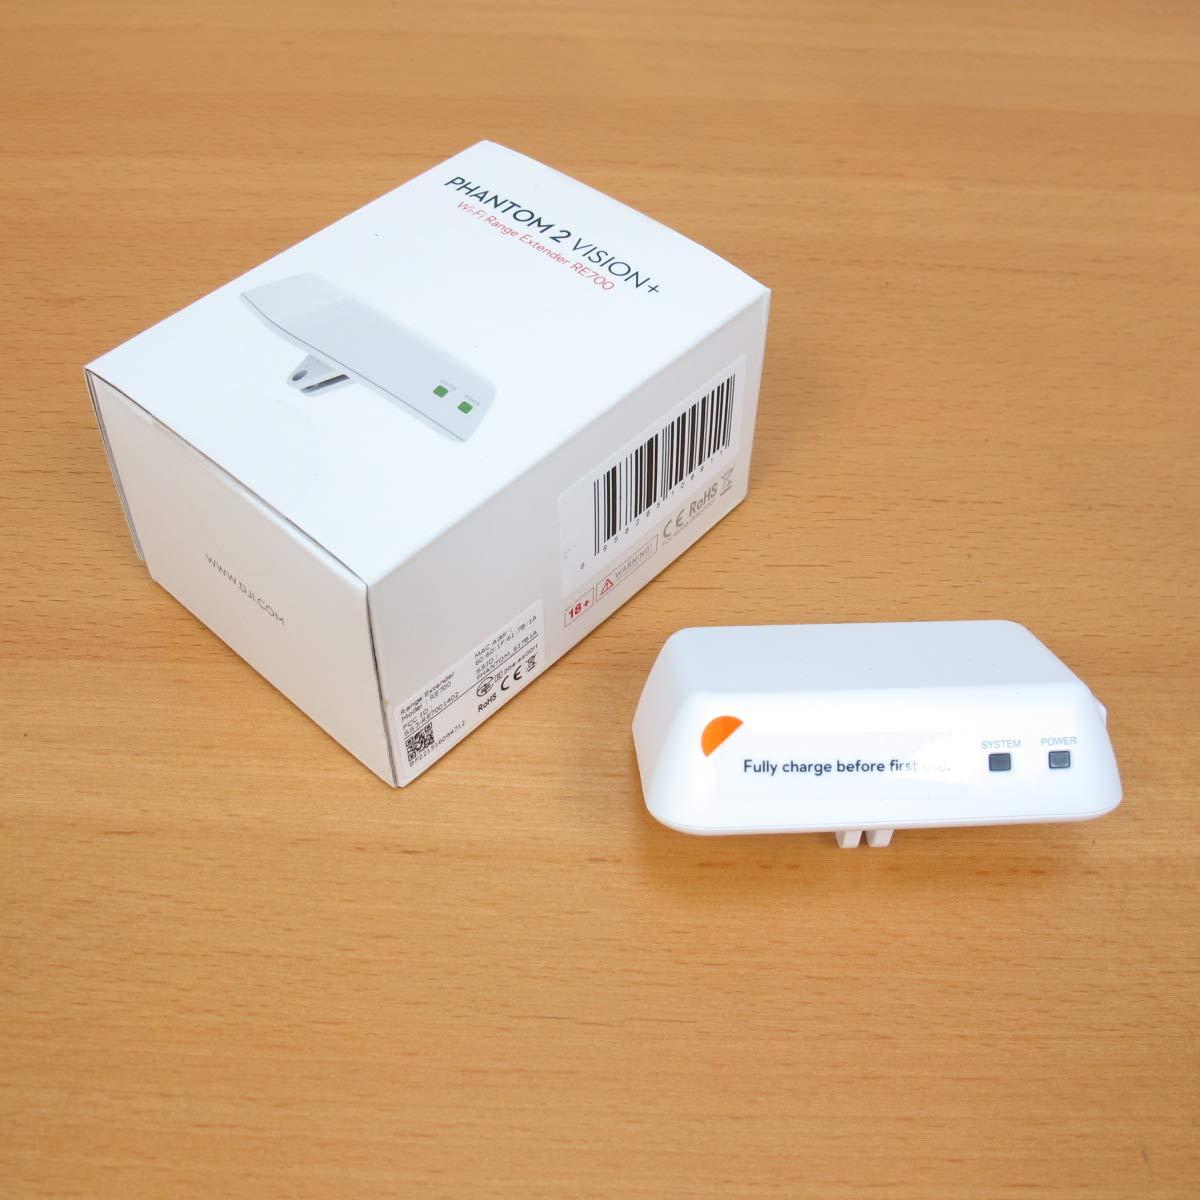 DJI Wi - Fi Extender re700 for Phantom 2 Vision Plus   B07G4HTKJ5